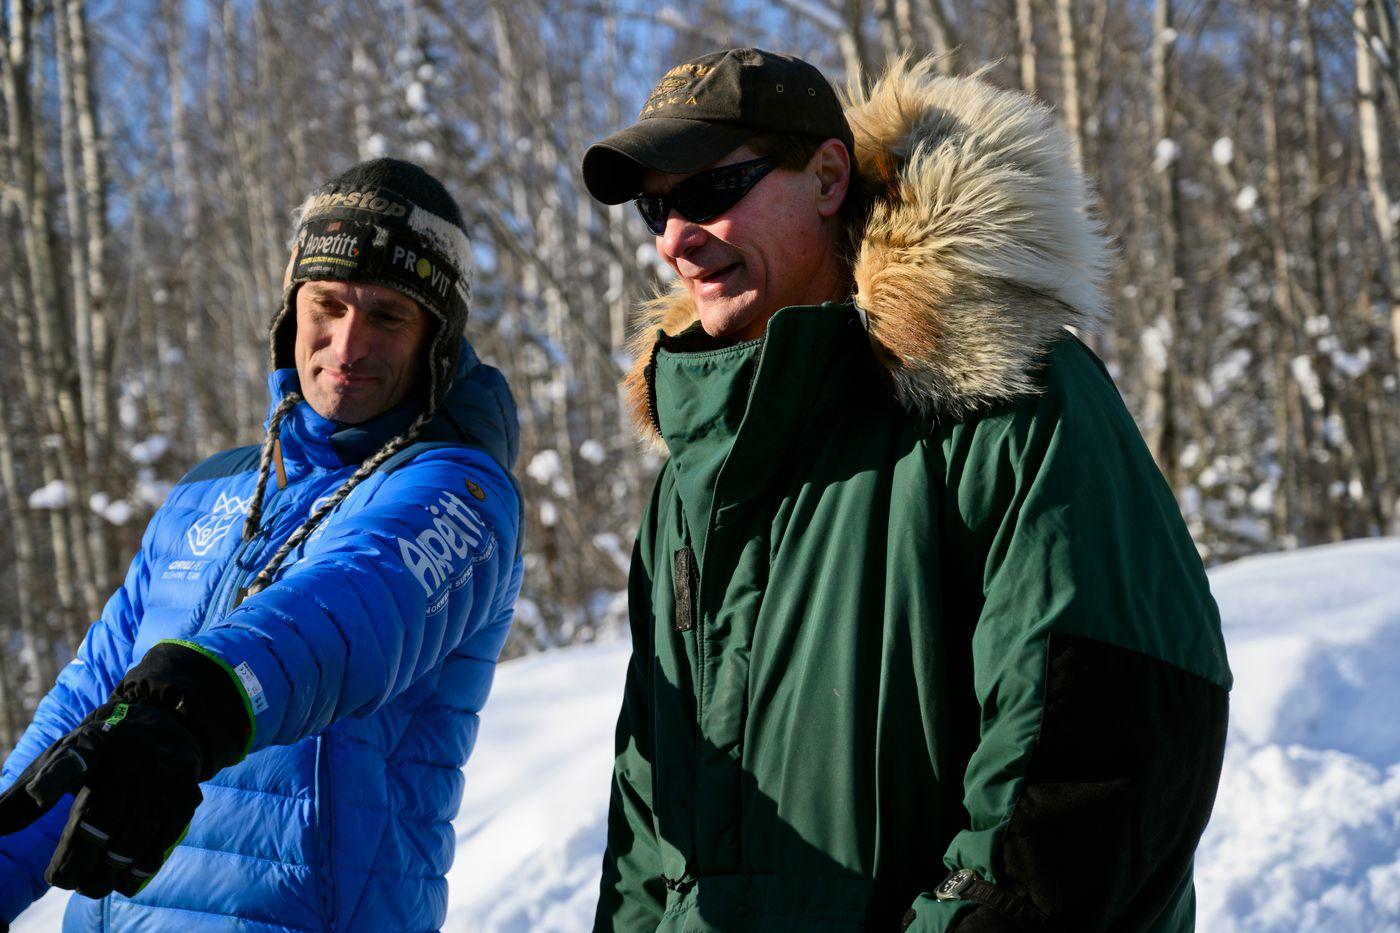 Iditarod chief veterinarian Stuart Nelson, right, talks with people at Iditarod Headquarters in Wasilla on March 4, 2020. (Marc Lester / ADN)